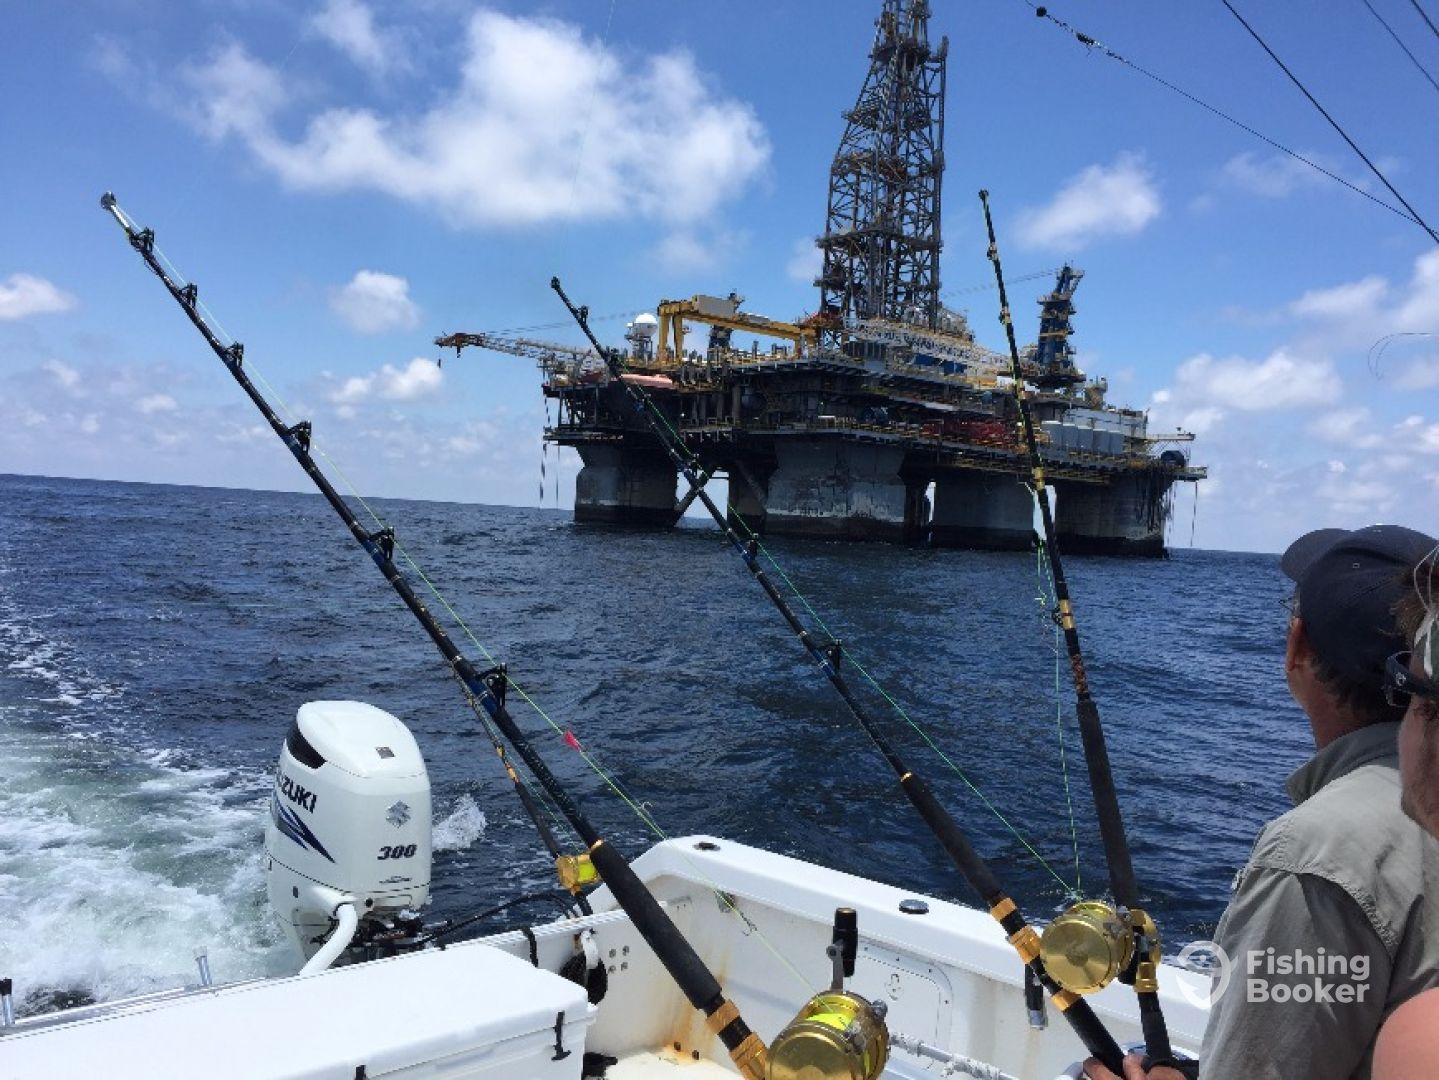 Coastal charters port aransas tx fishingbooker for Port aransas fishing charters